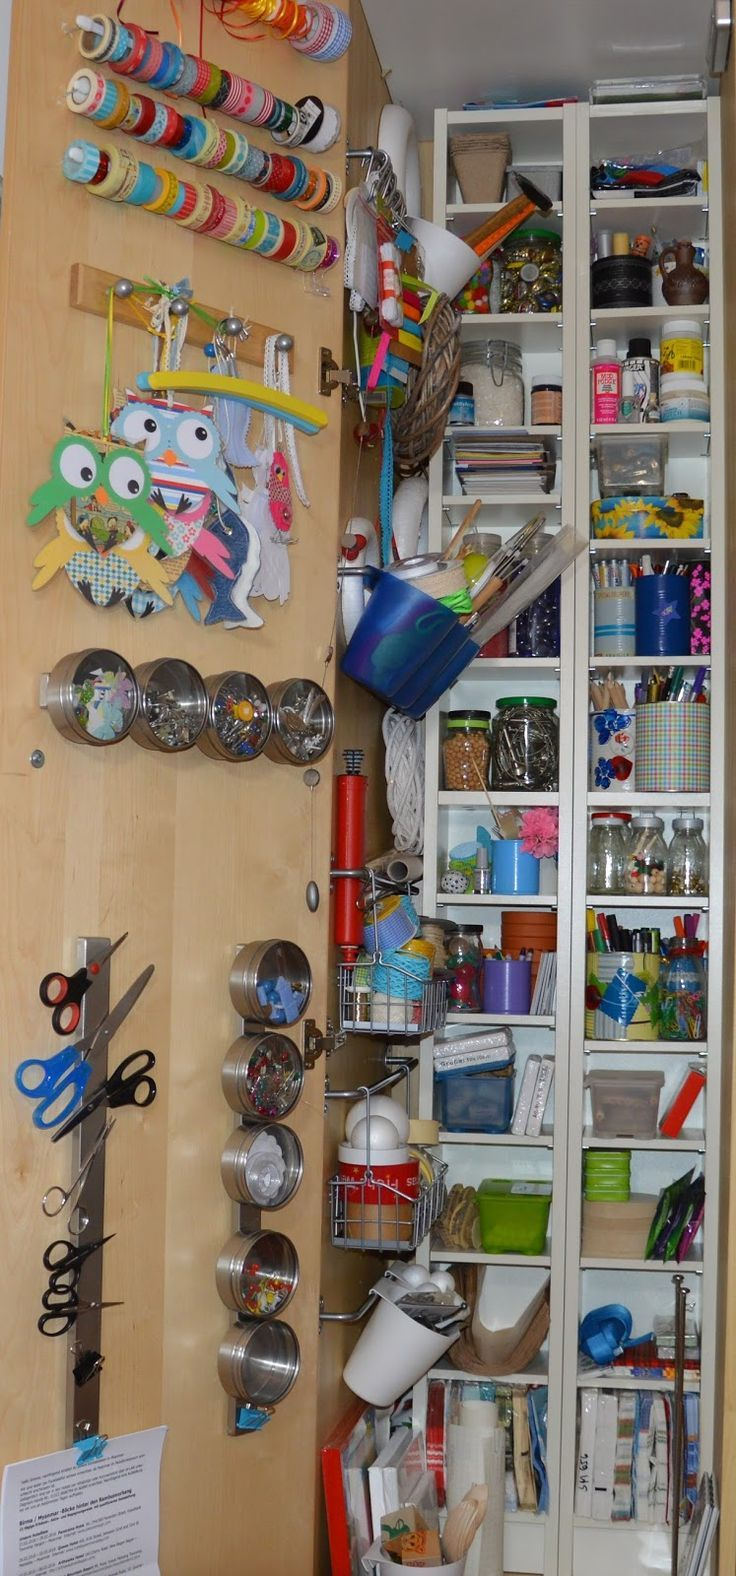 selber, machen, basteln, diy, ideen, anleitung, selbermachen, IKEA, Ordnung im B